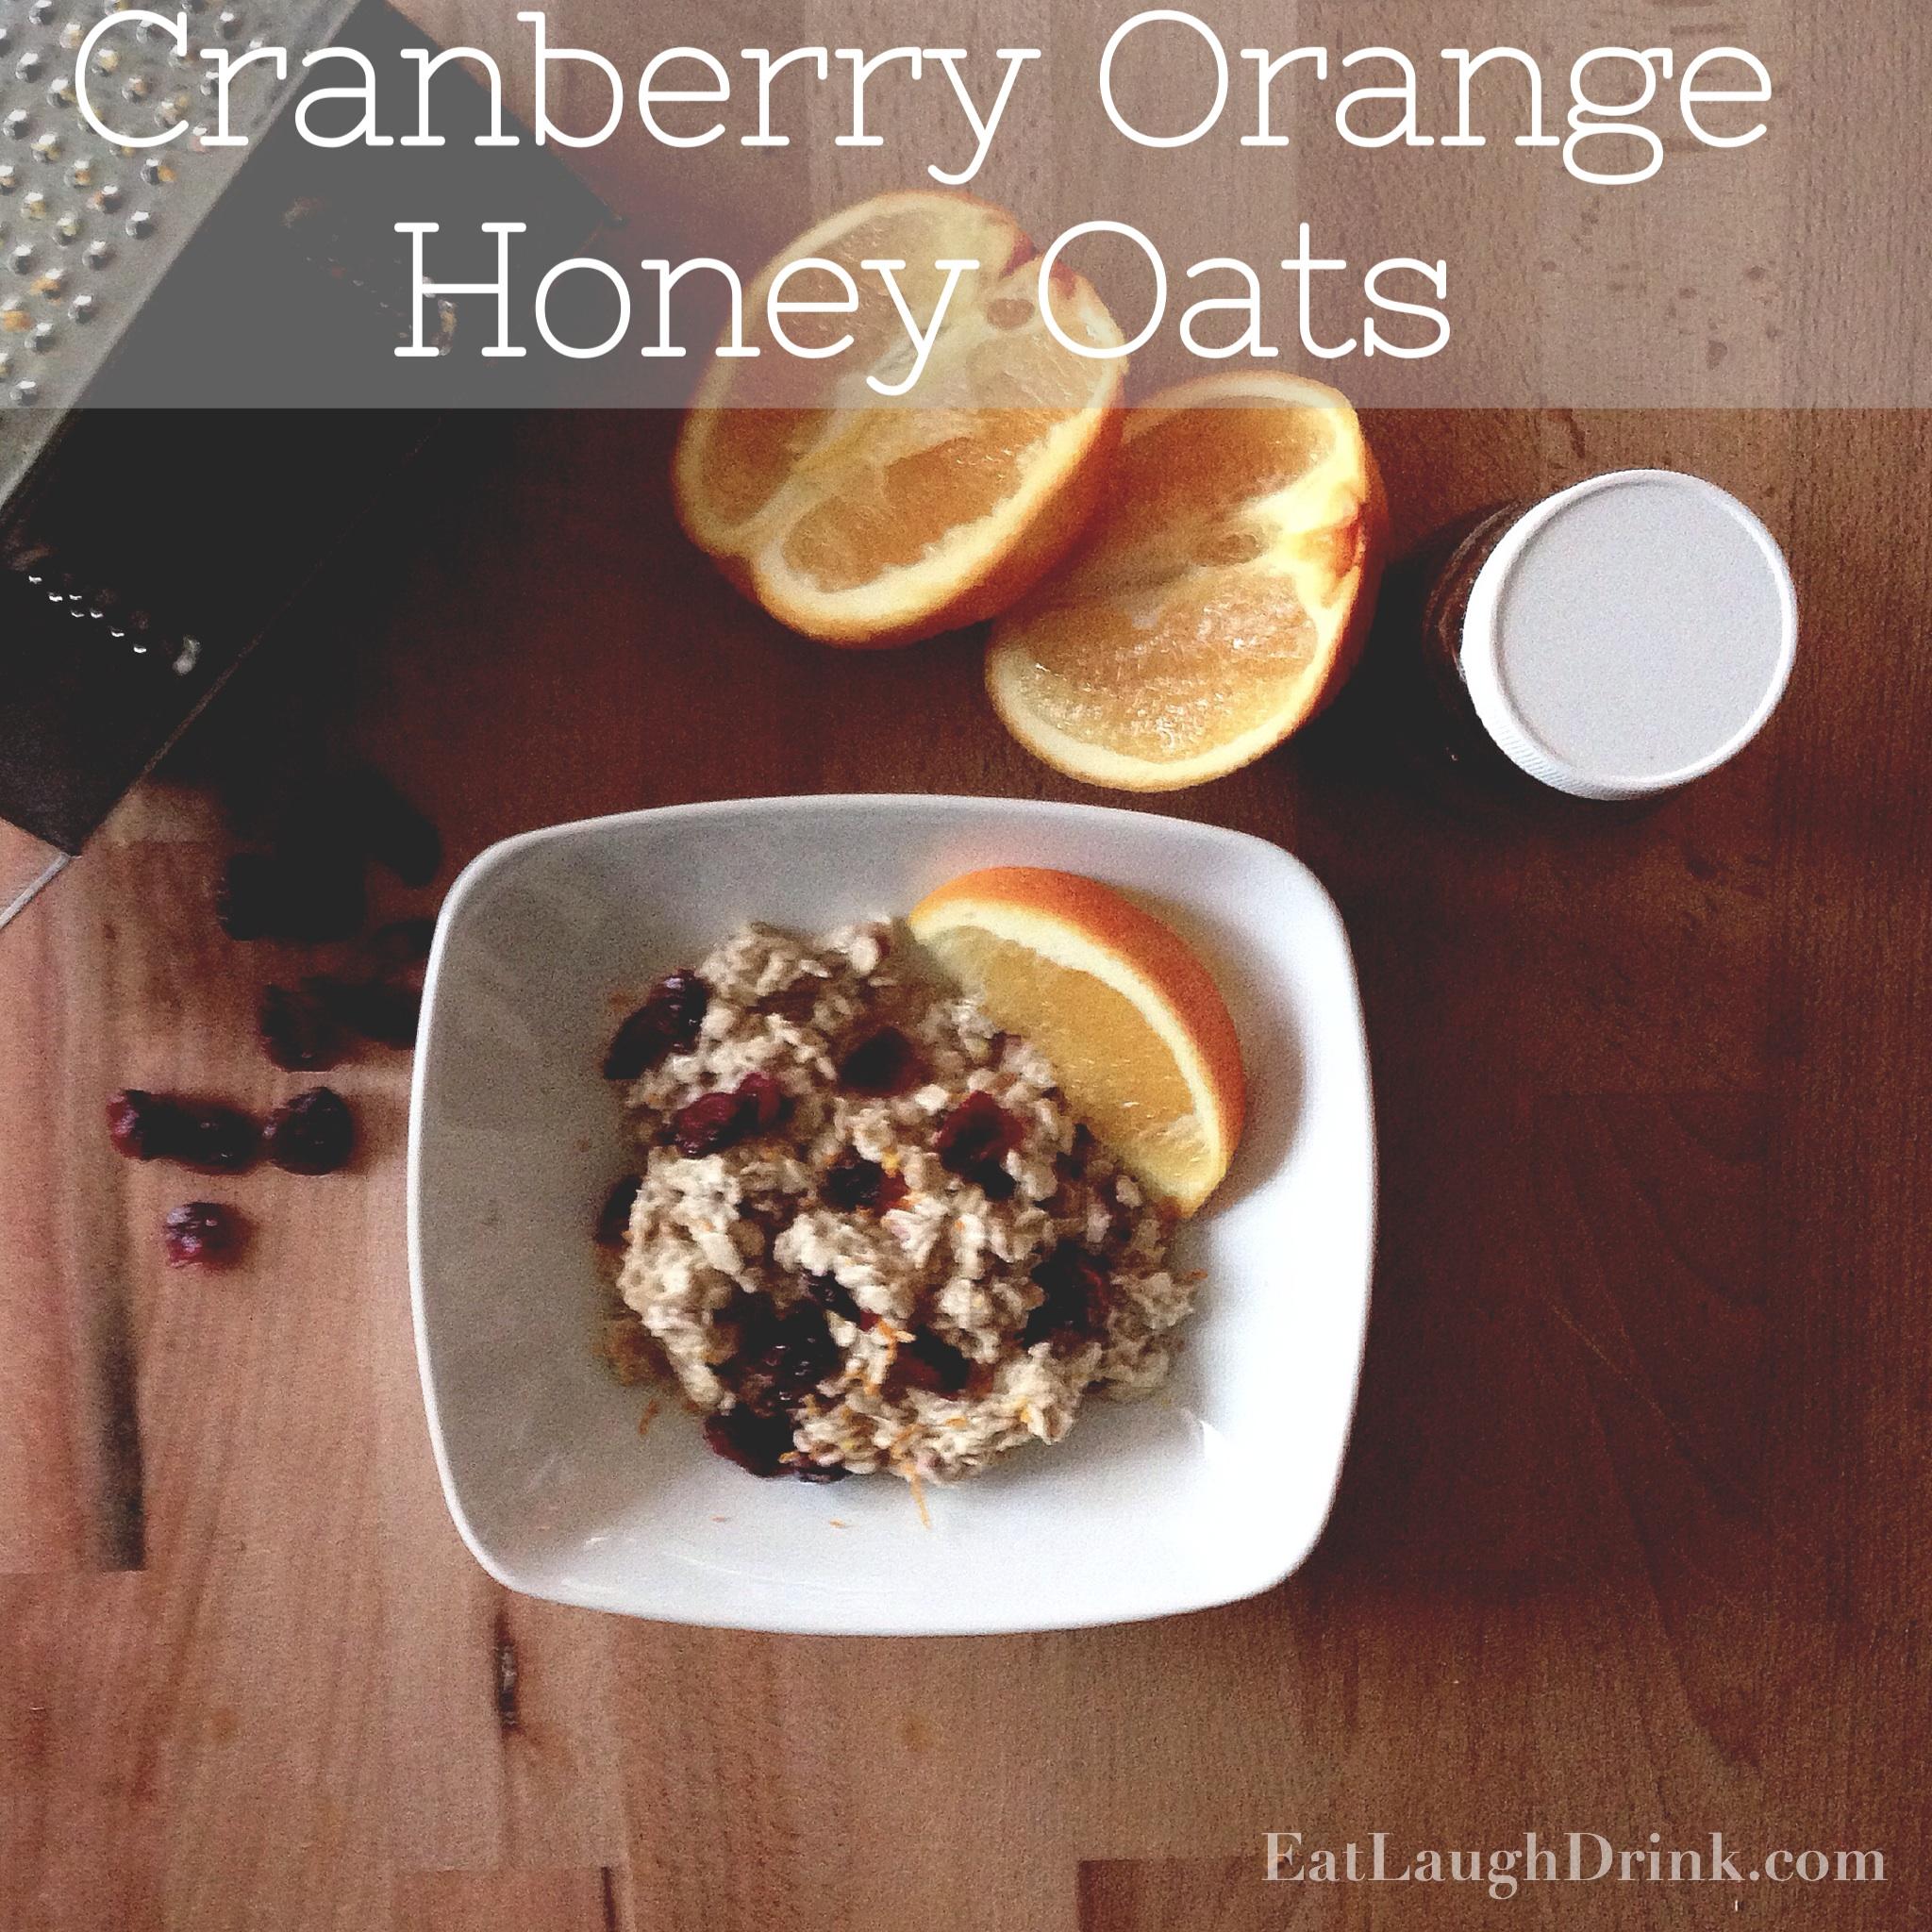 Cranberry Orange Honey Oats - Clean Eating Breakfast